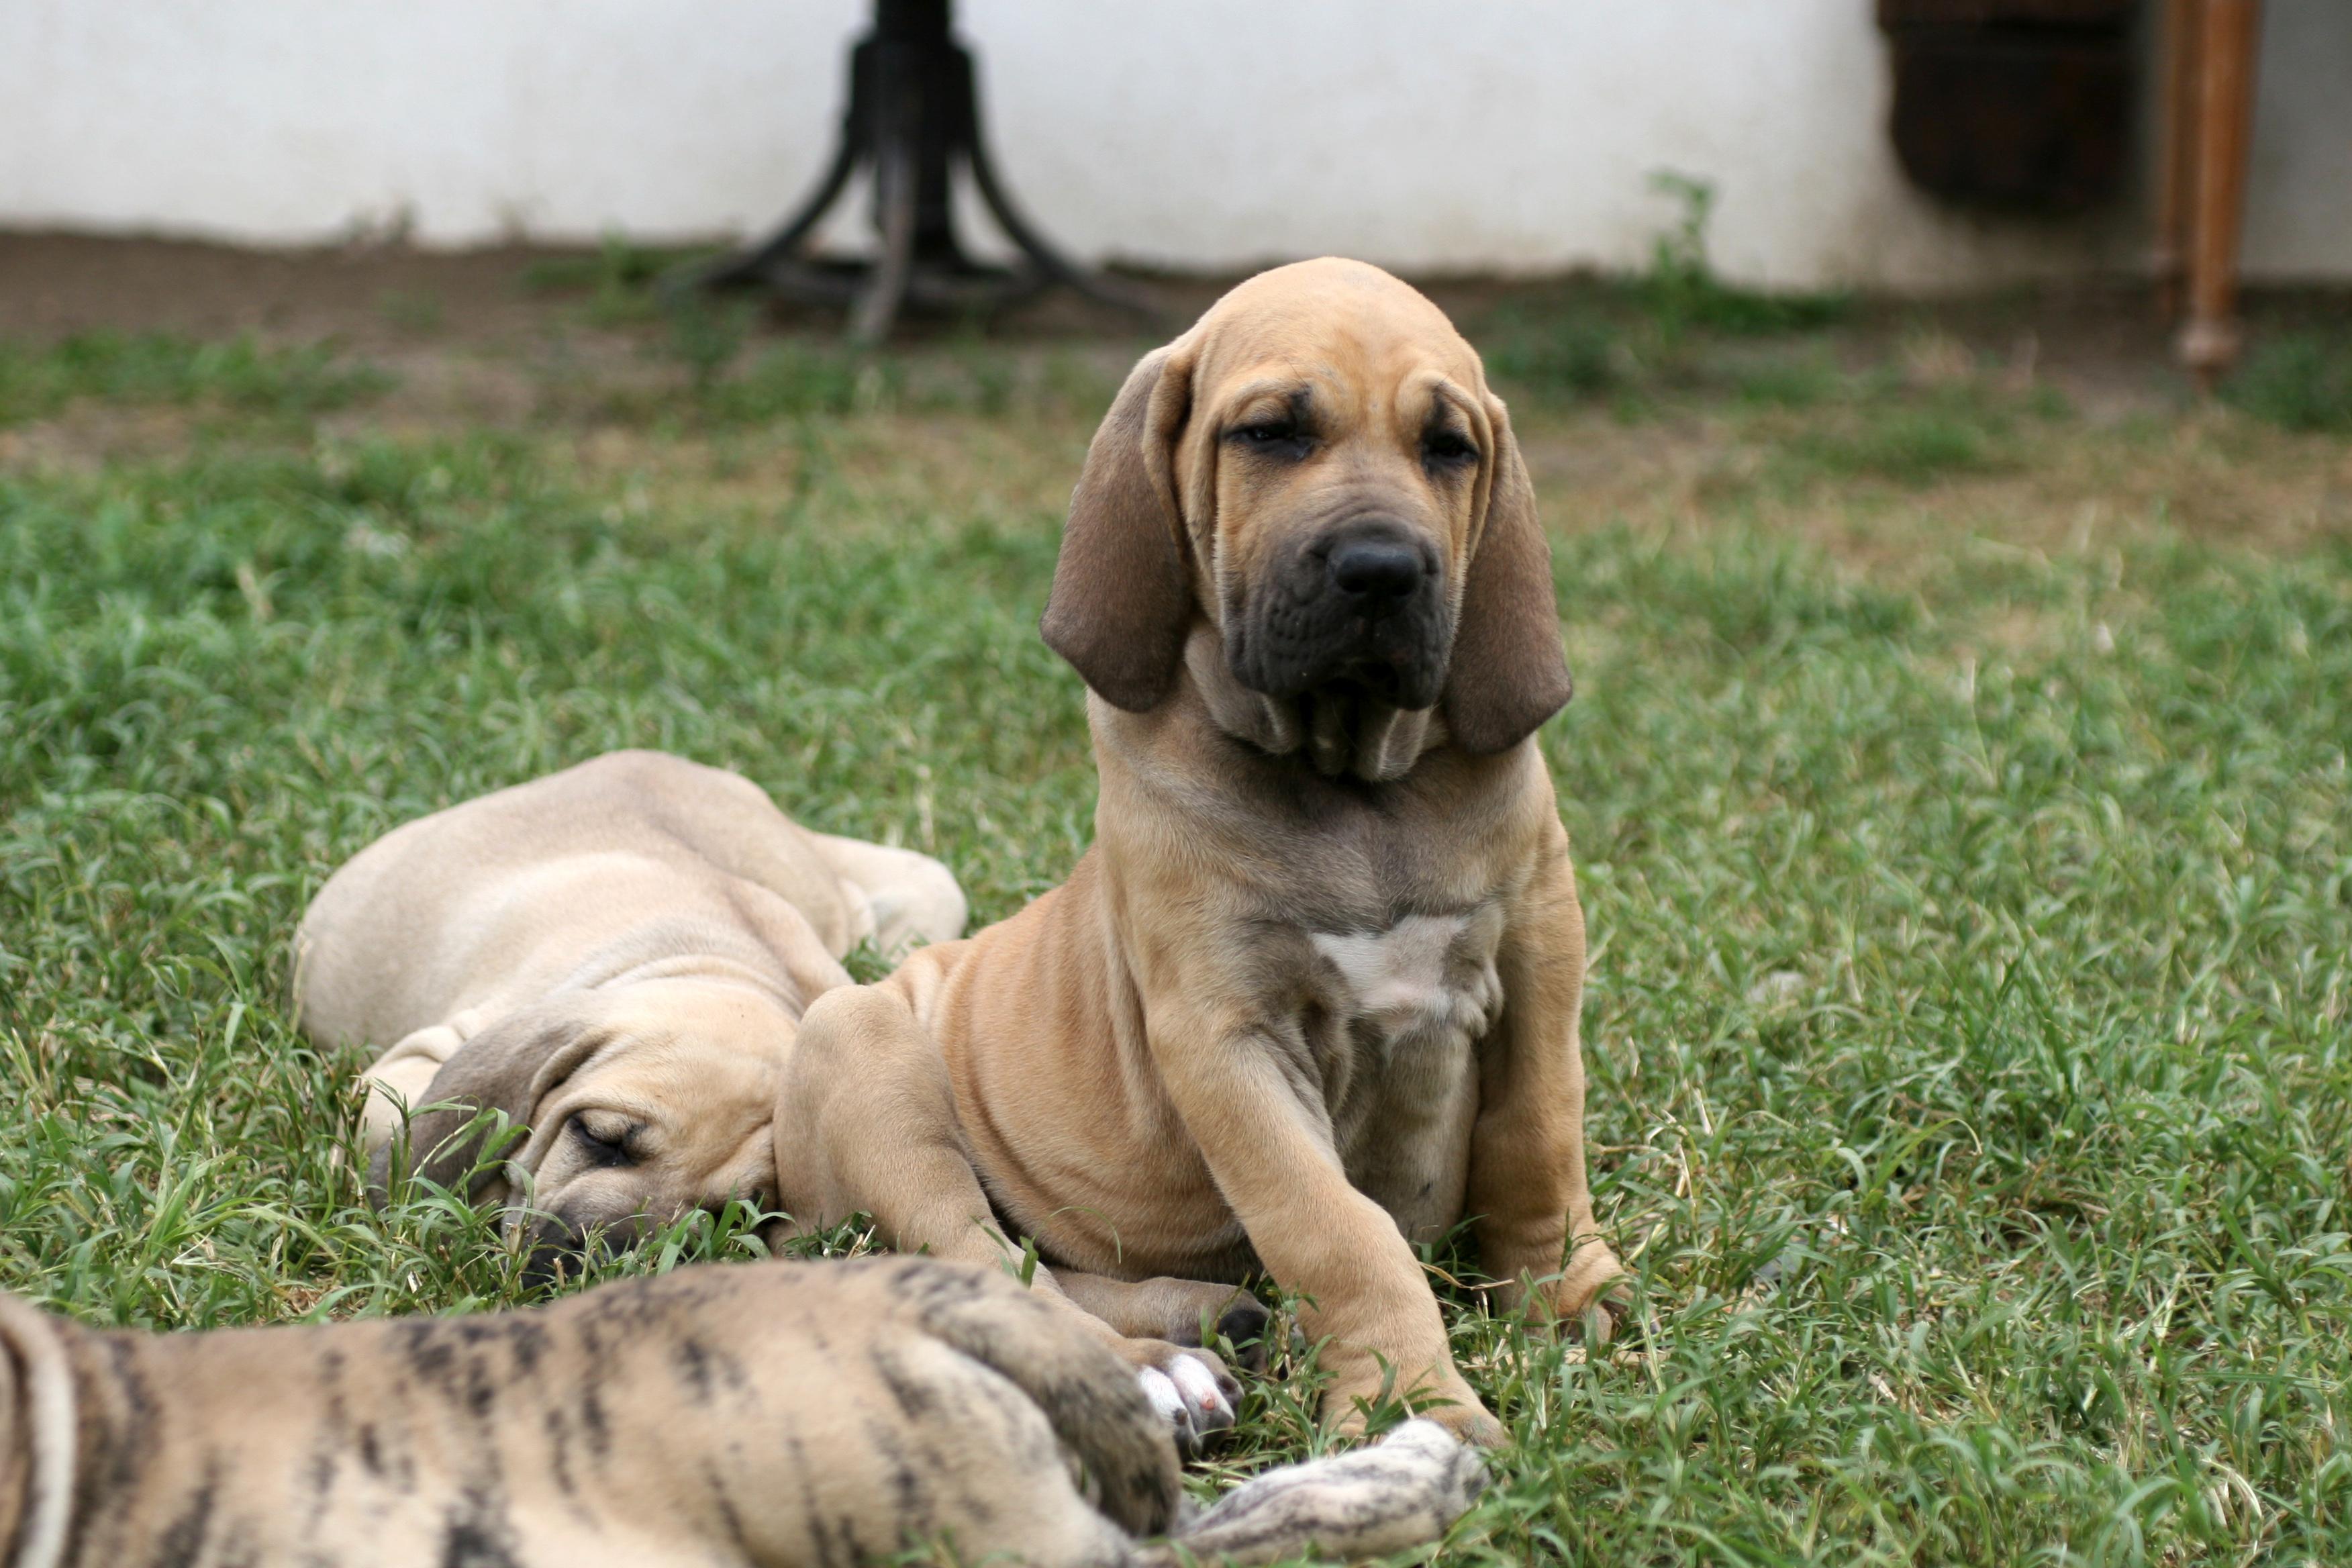 Bea Harakhan - apricot female Fila puppy